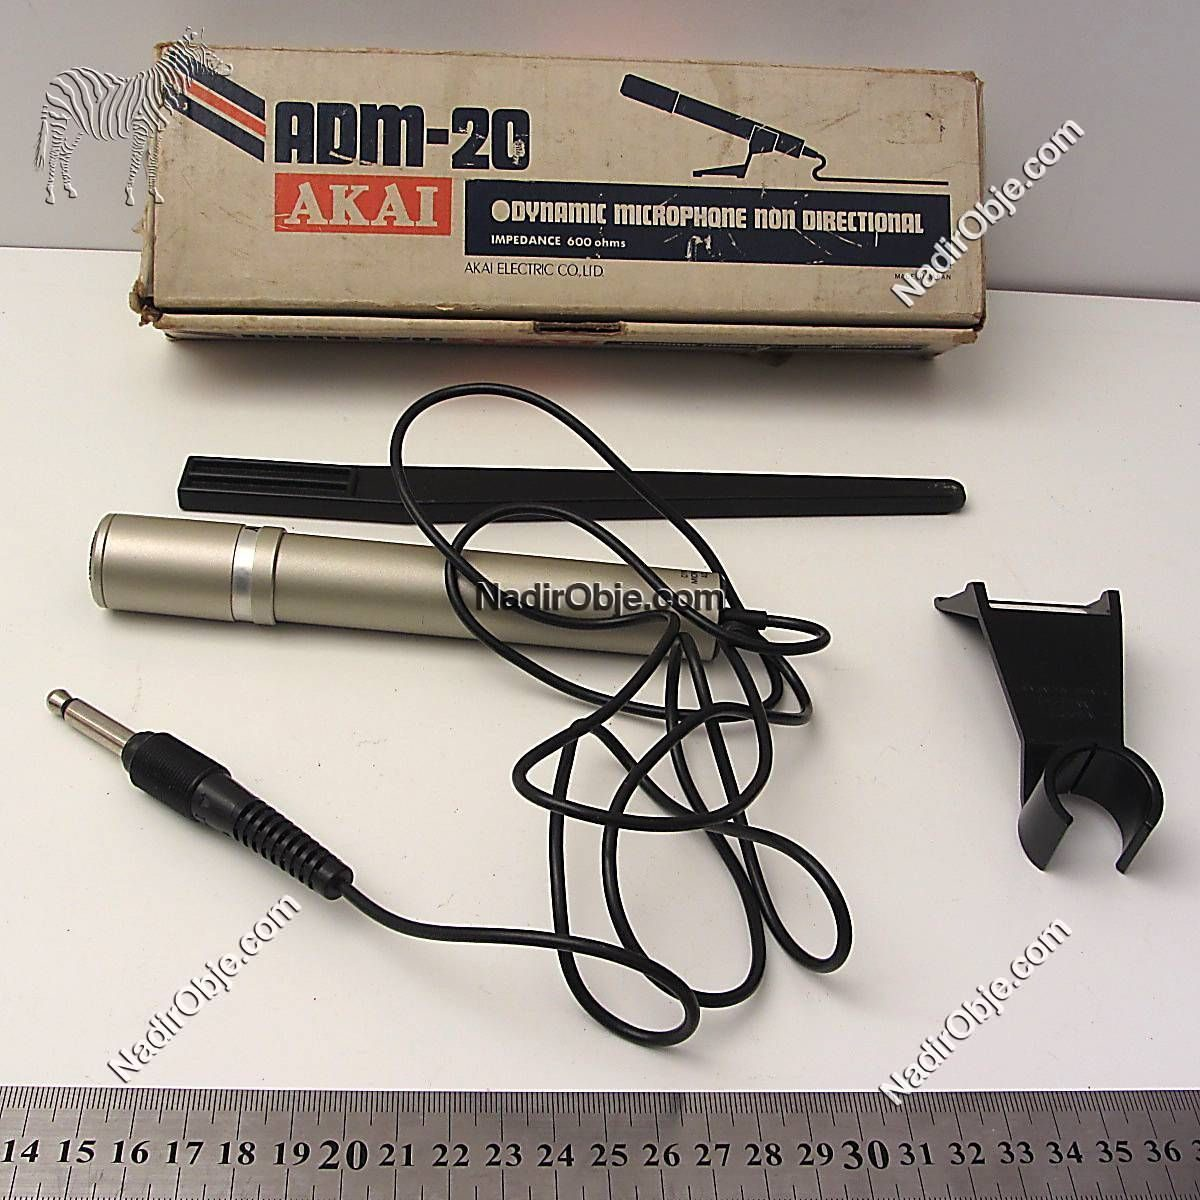 Akai Dinamik Mikrofon Mekanik-Elektrikli Objeler Akai